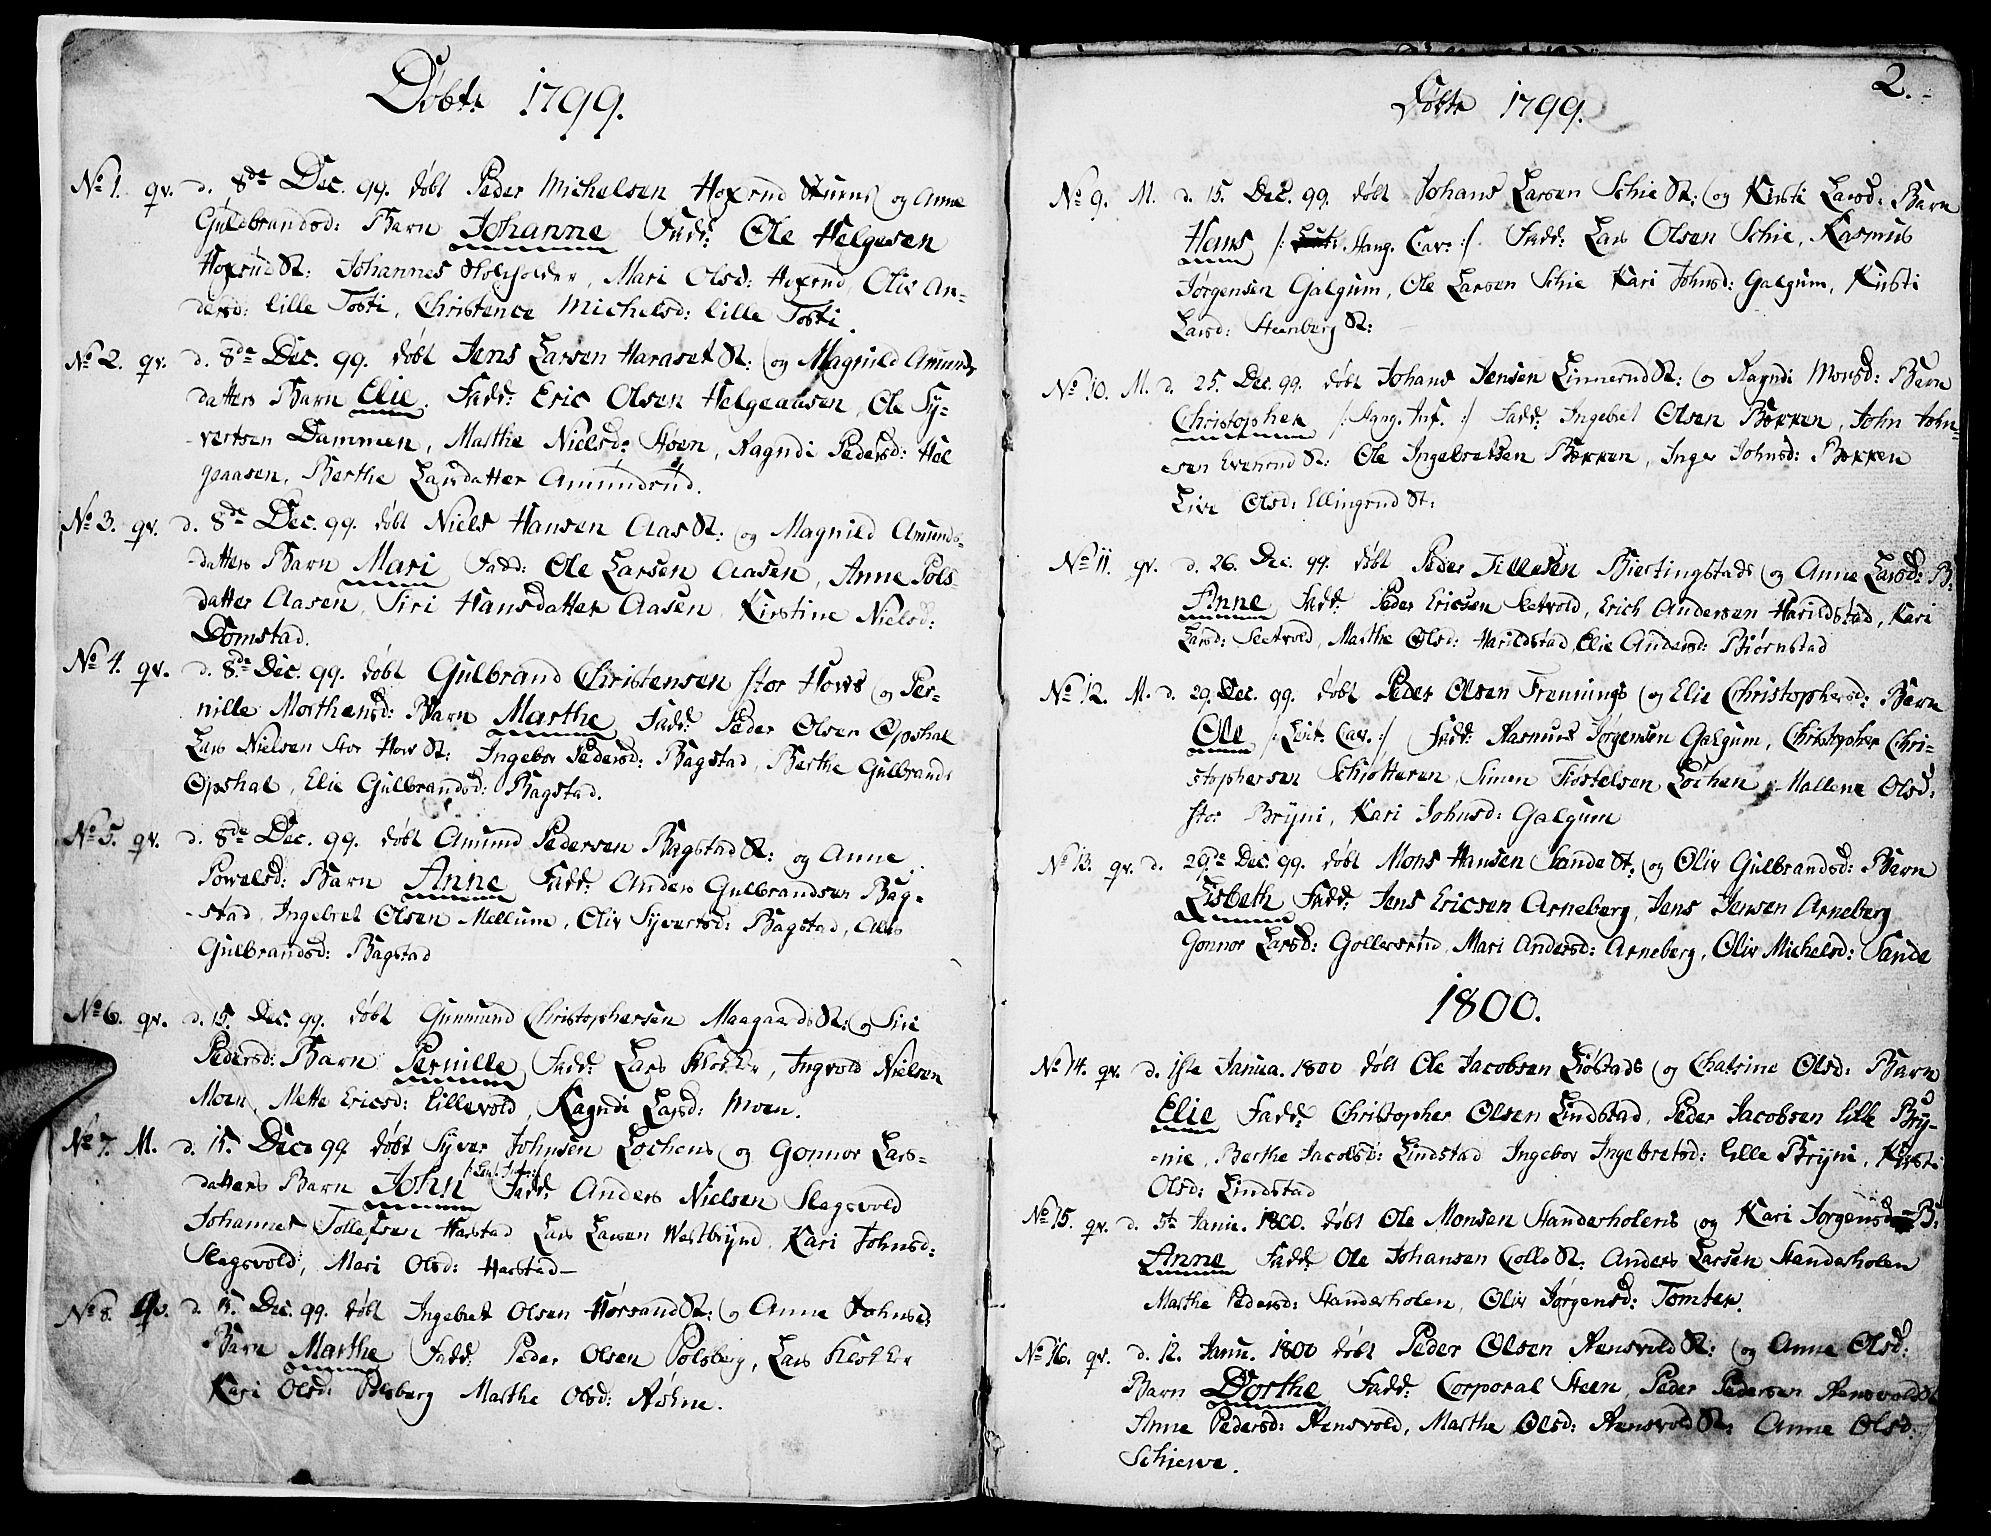 SAH, Romedal prestekontor, K/L0001: Ministerialbok nr. 1, 1799-1814, s. 2